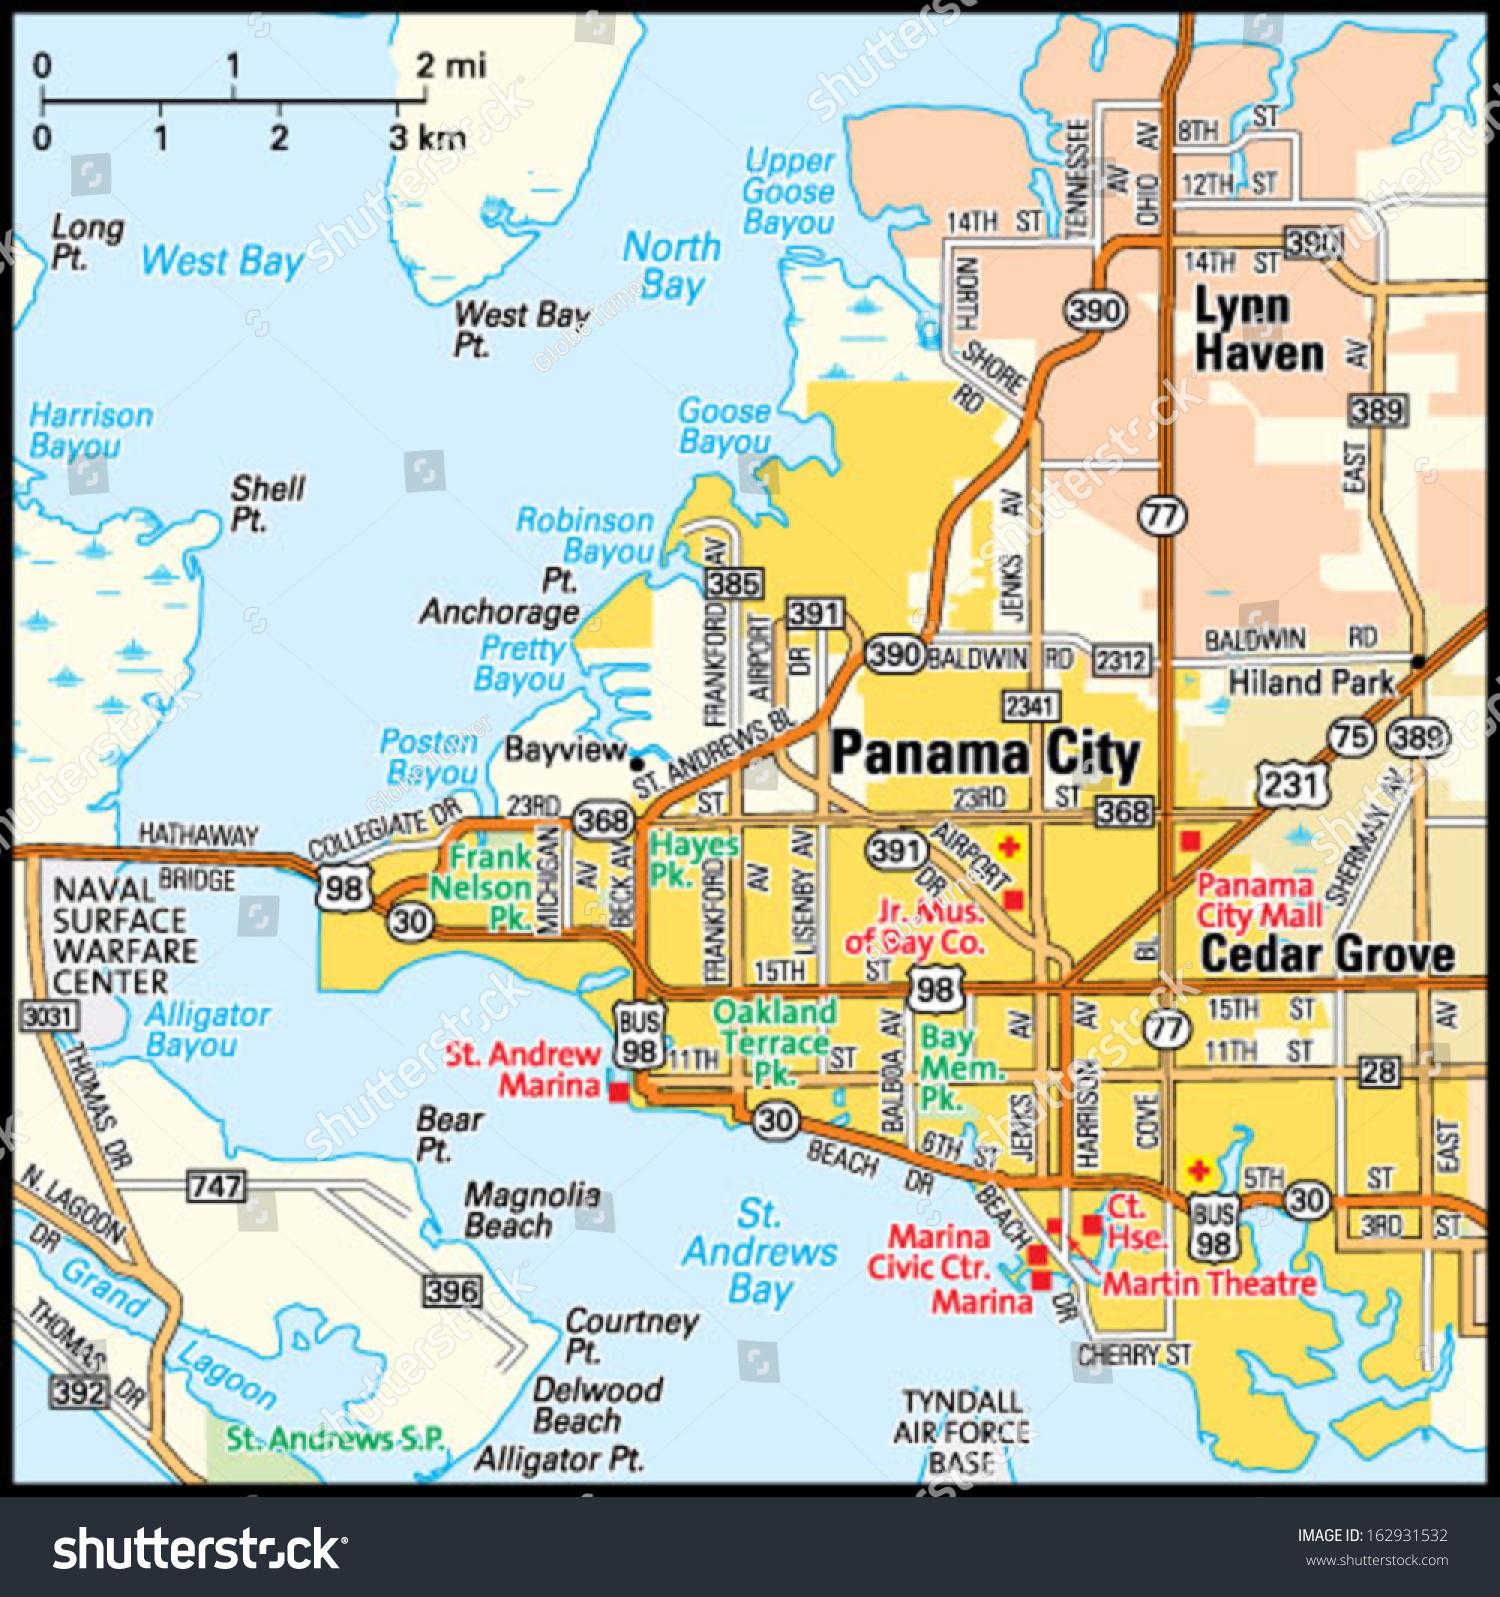 Panama City Florida Map From Image 1 - Ameliabd - Panama Florida Map